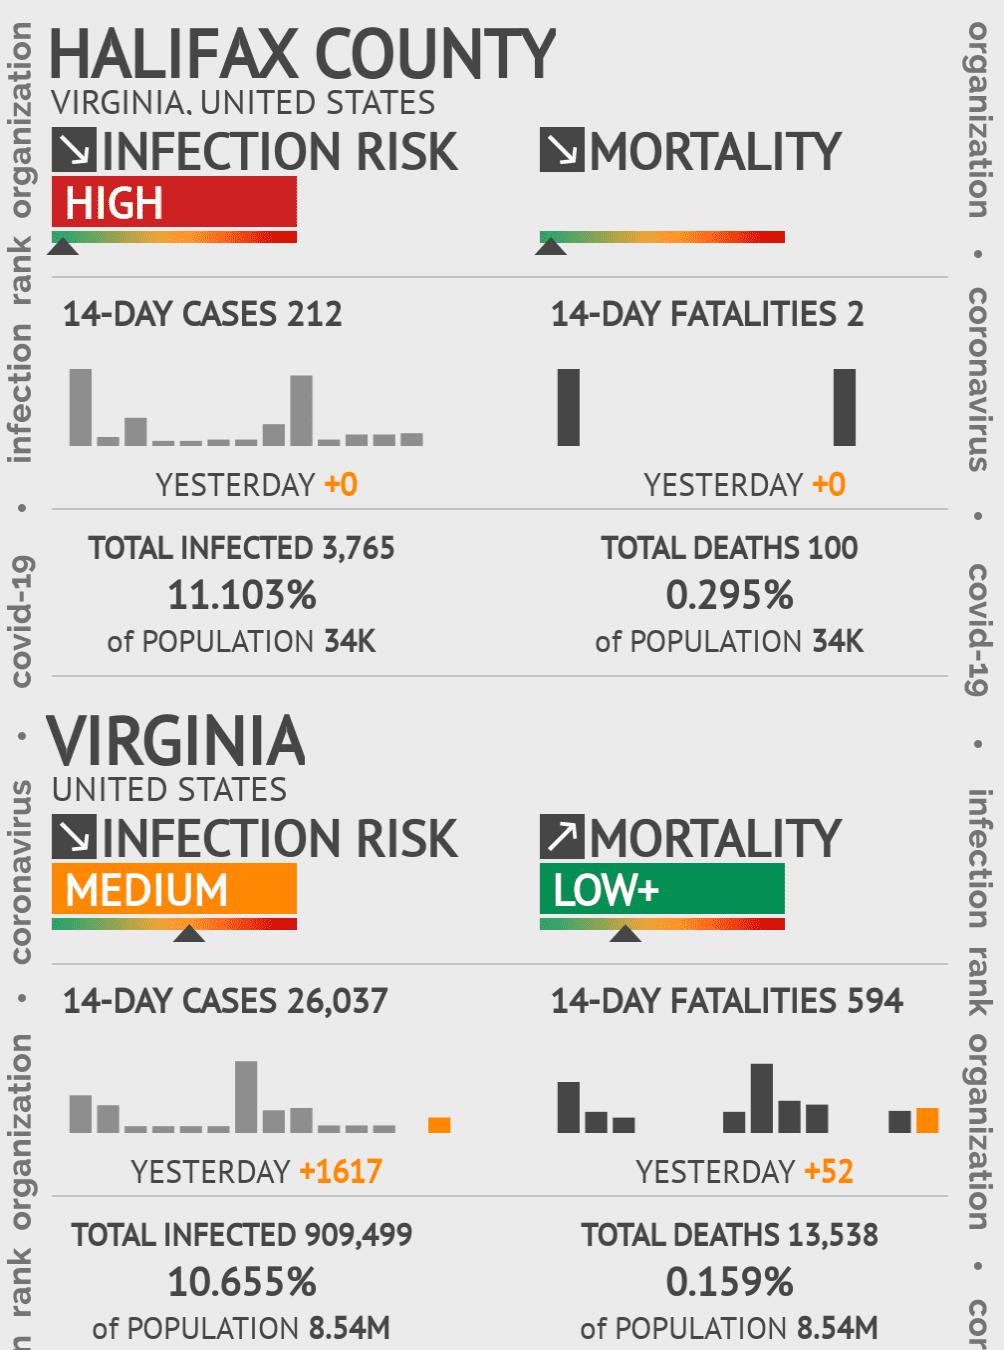 Halifax County Coronavirus Covid-19 Risk of Infection on July 24, 2021